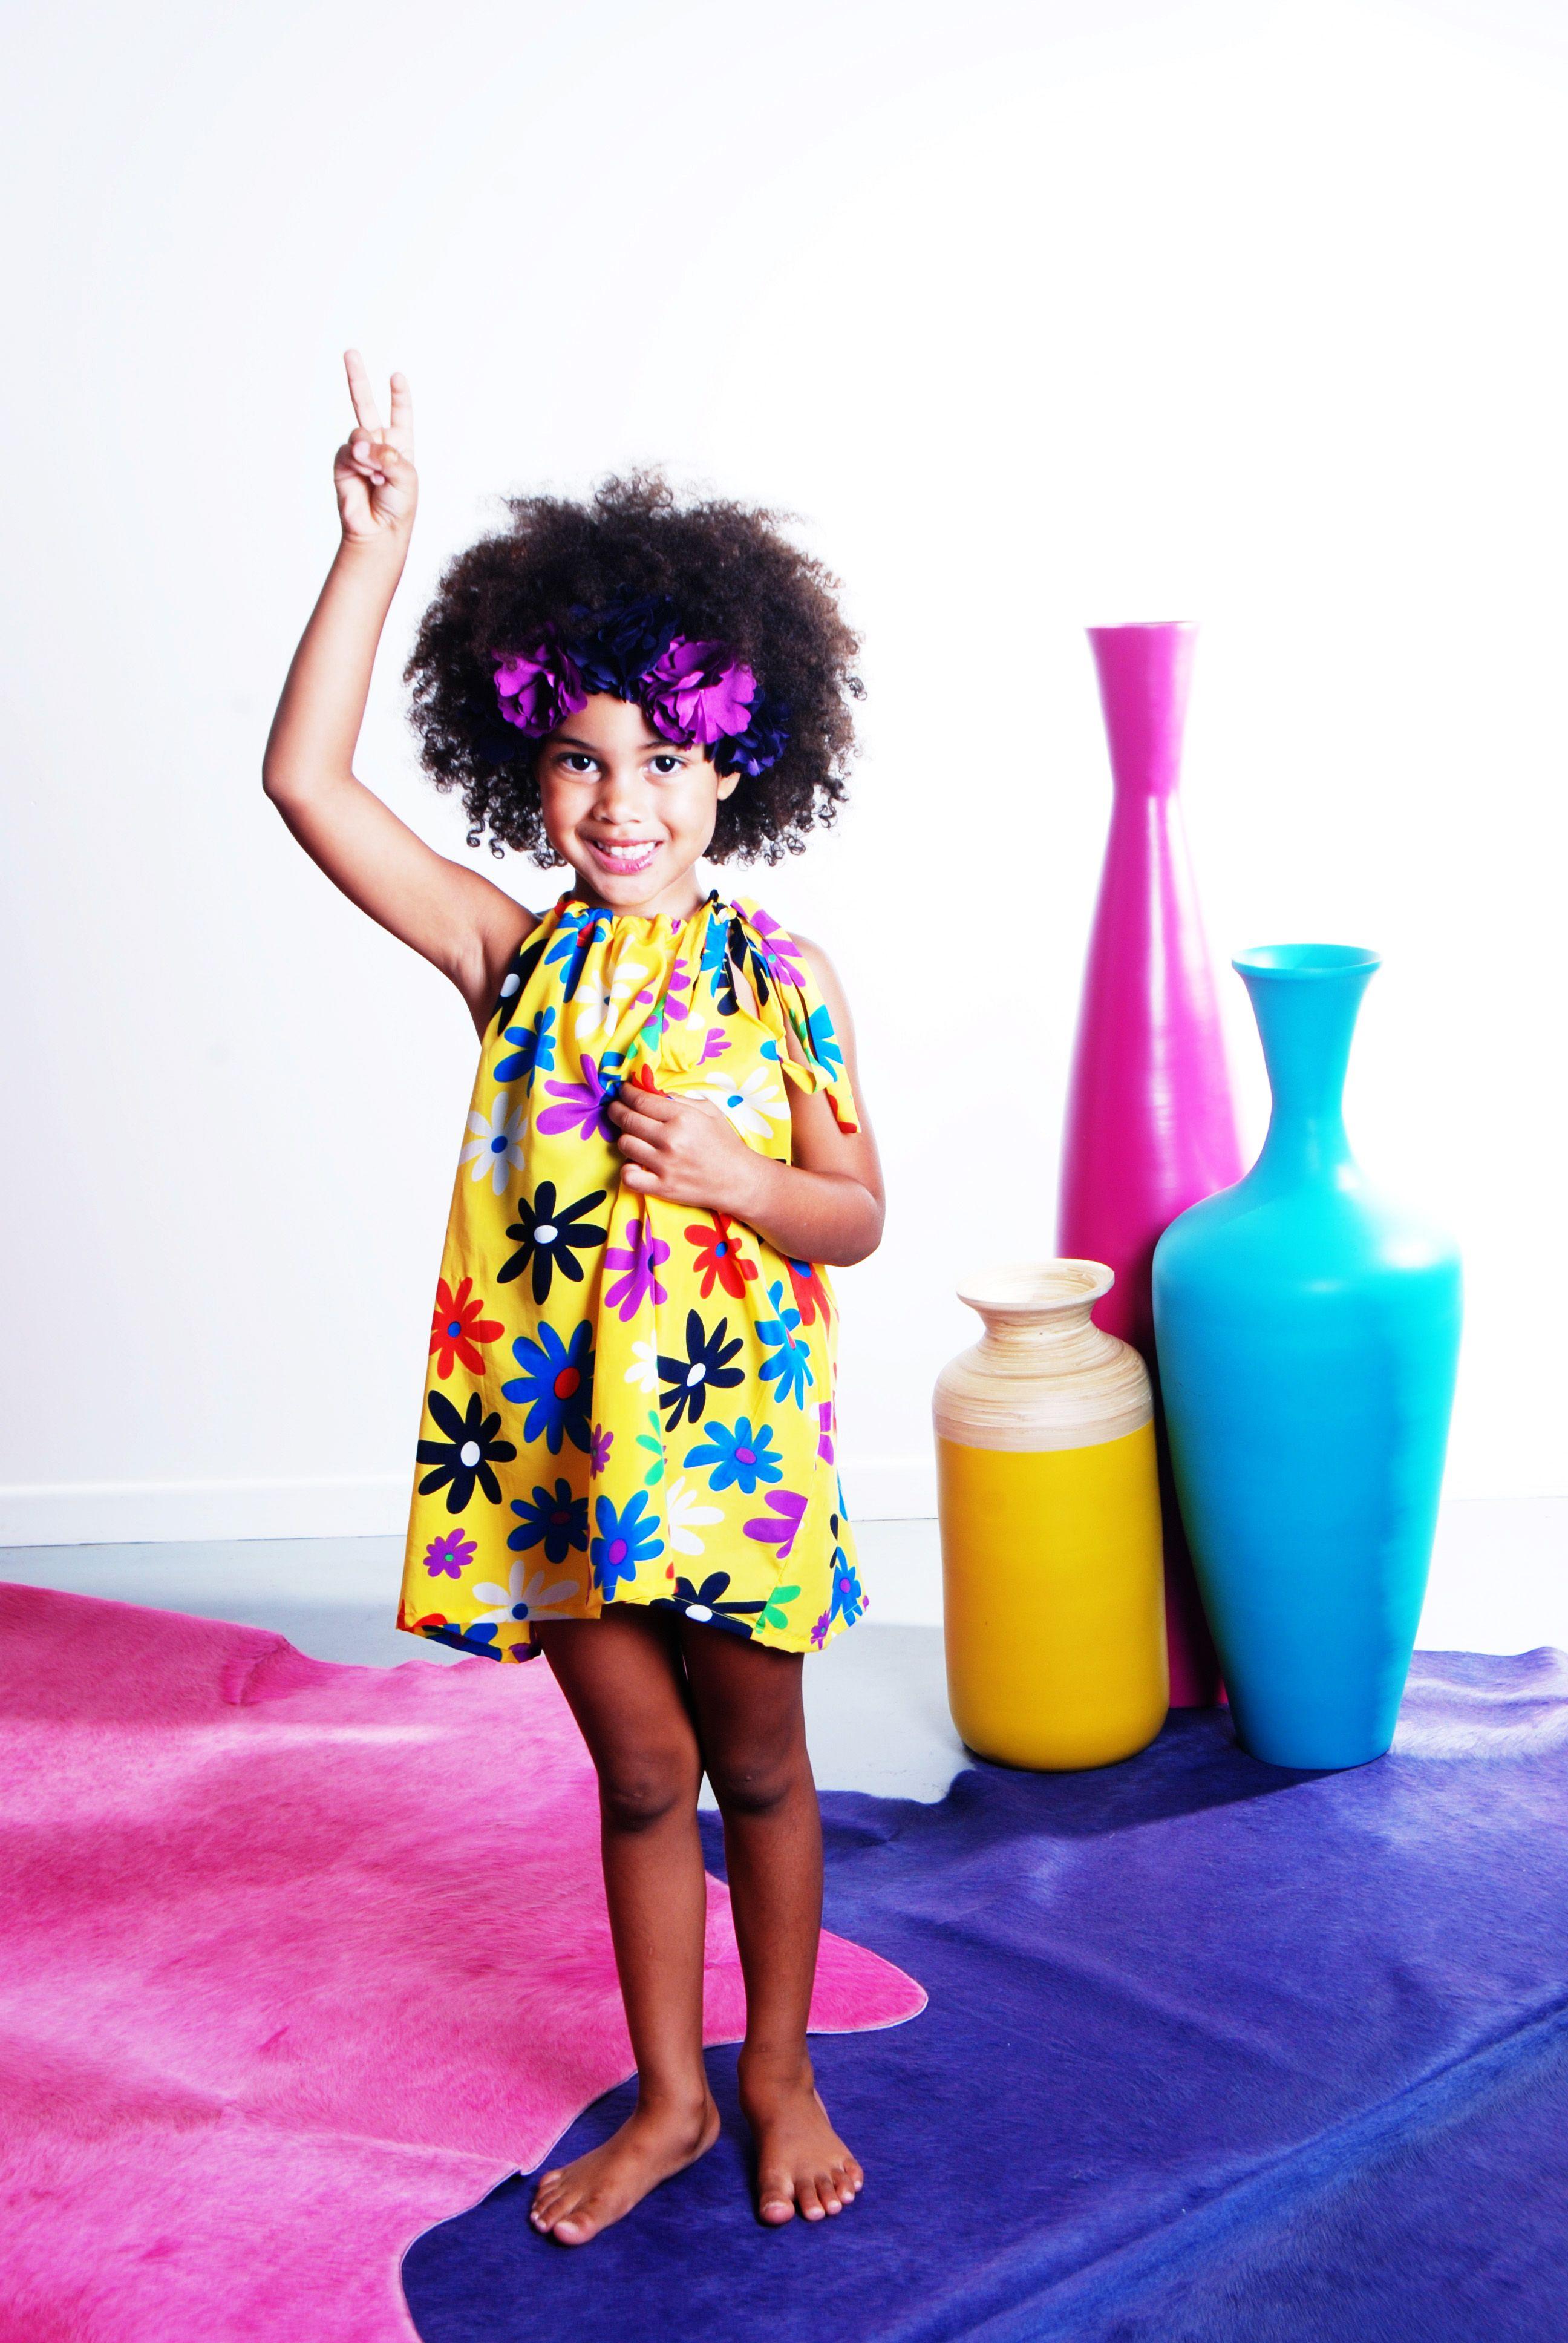 #dinjuan #fashion #bohemian #tribe #gypsy #boho #junior #wanderlust #handmade #minime #retro #goddess #style #flower #flowerchild #flowerpower #kids #colour #vibe #boutique #love www.dinjuan.com